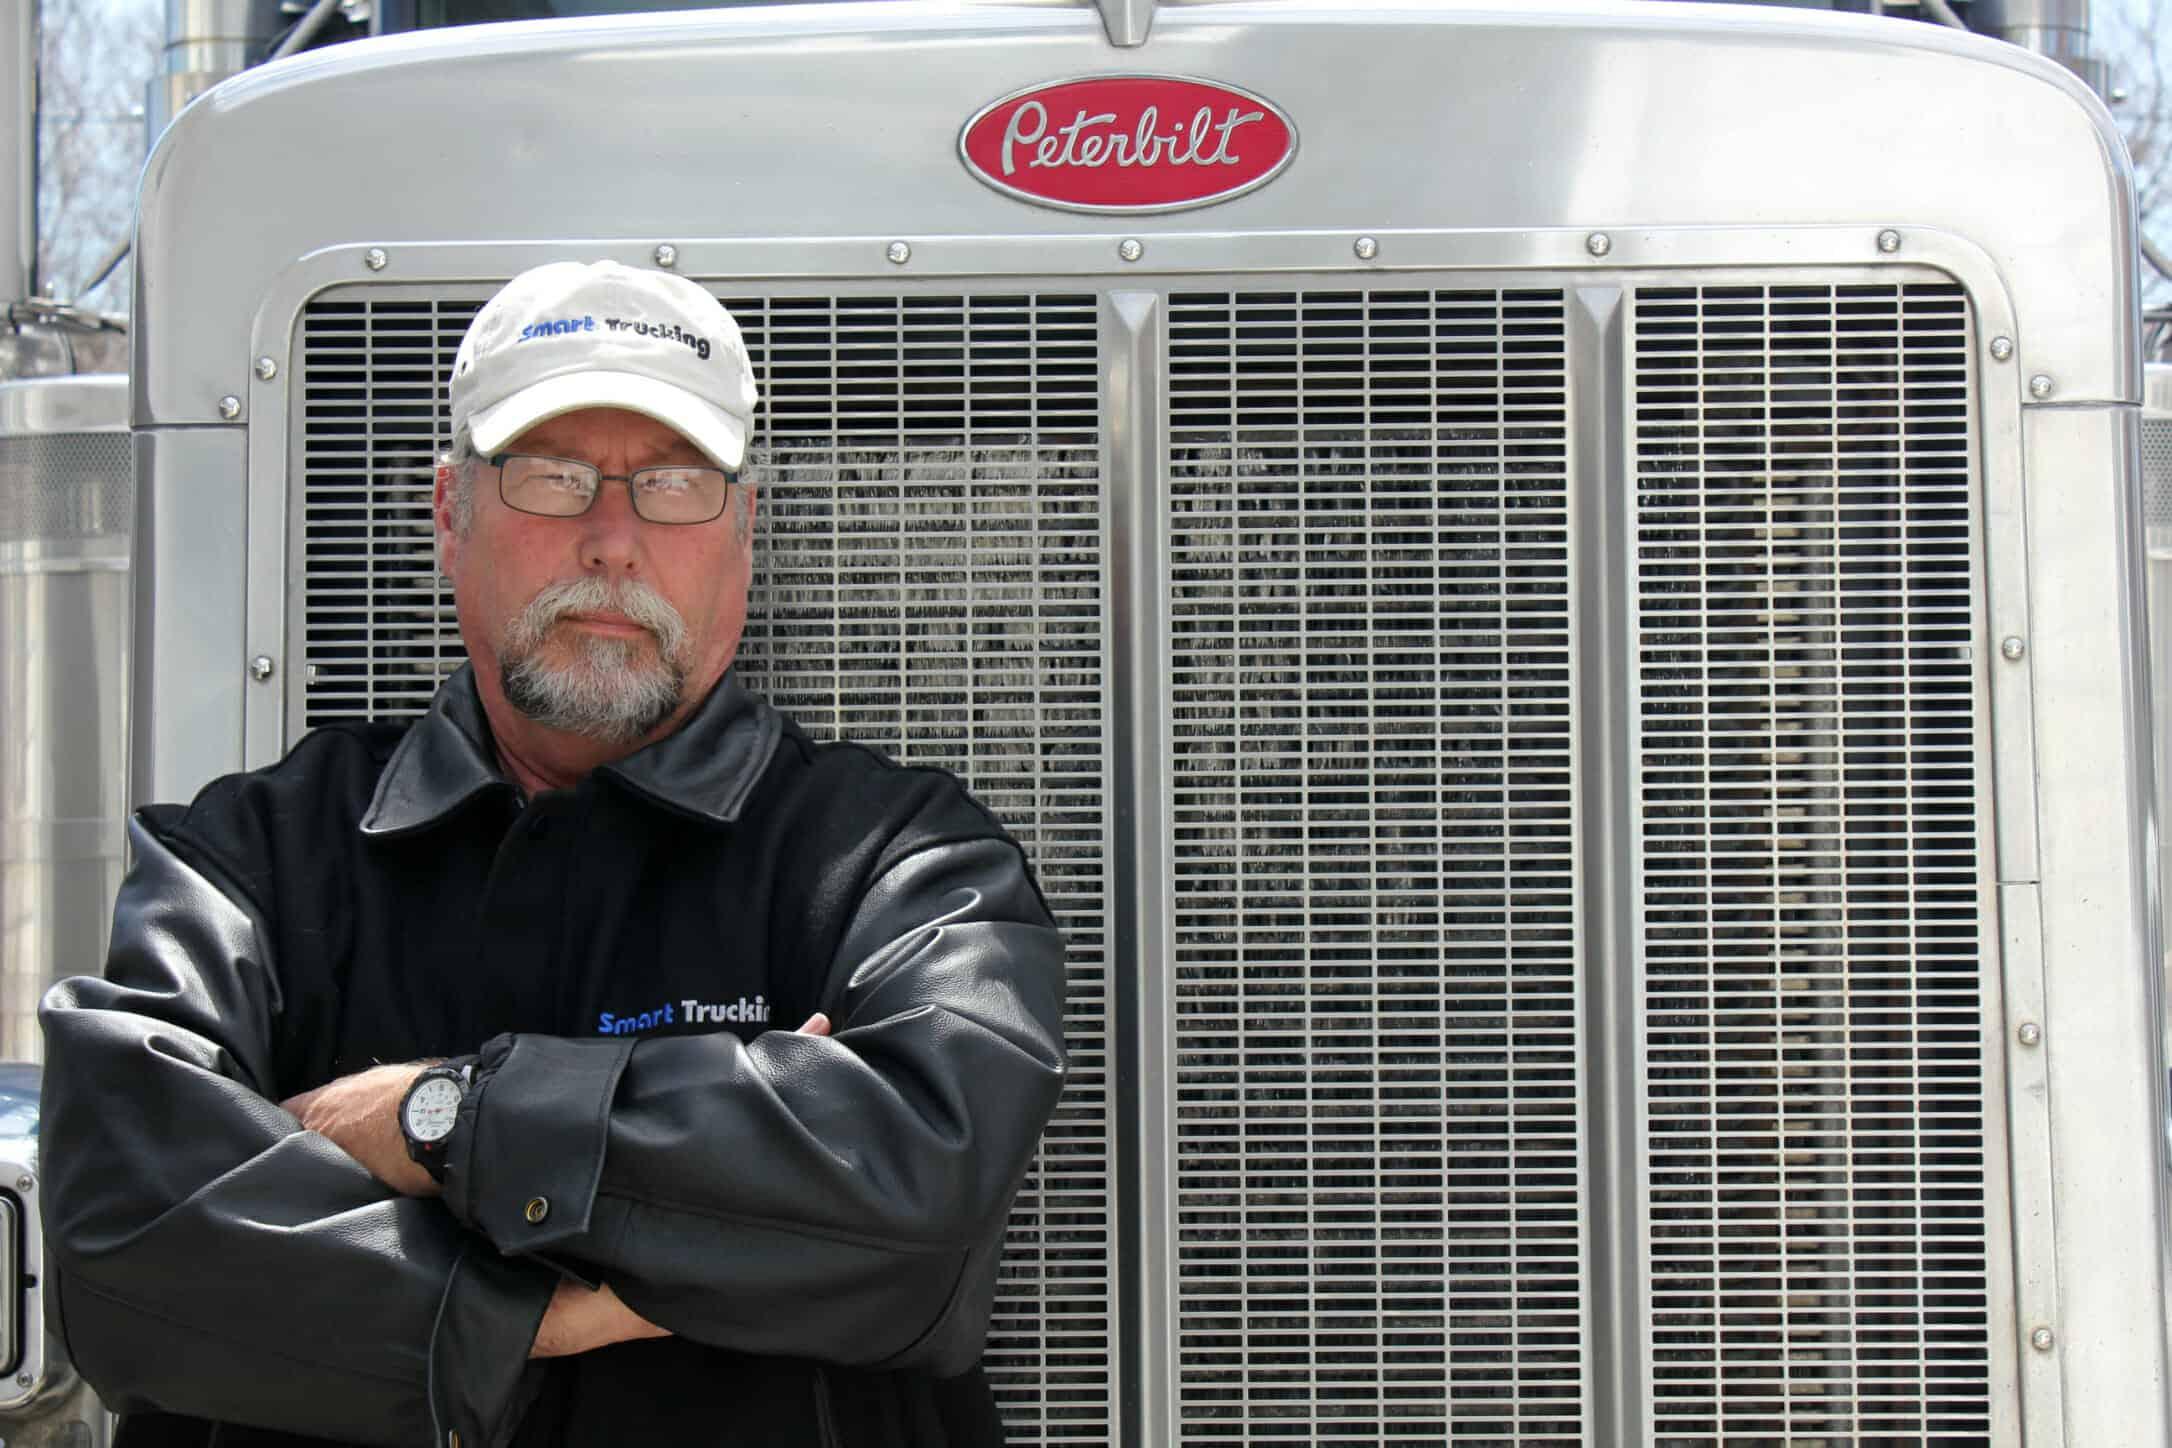 Trucker standing by Peterbilt Big Rig